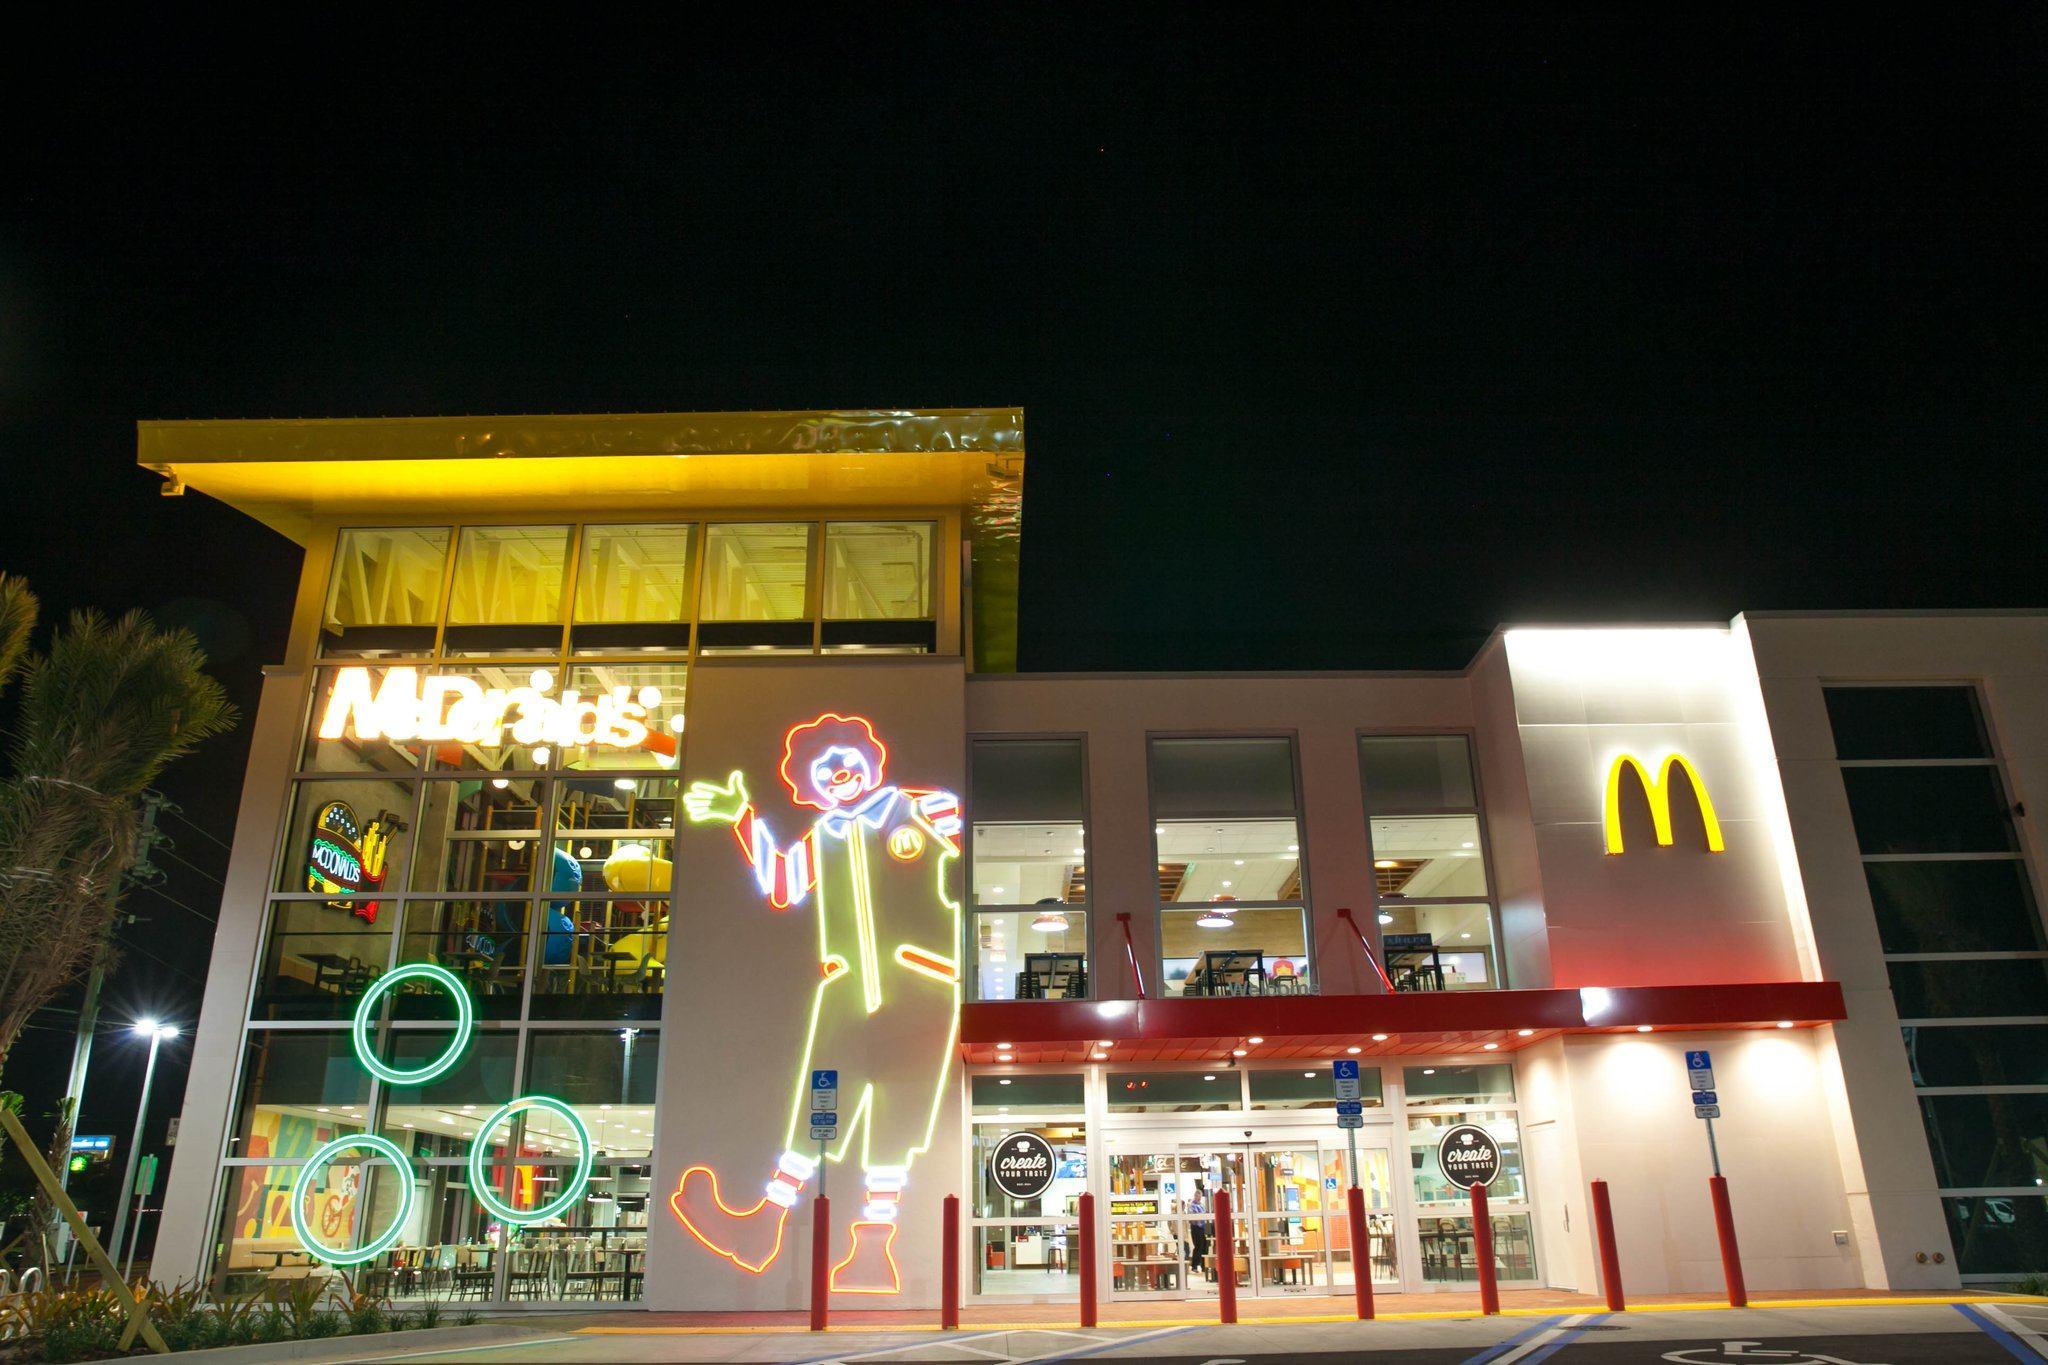 EpicMcD Orl Exterior Largest mcdonald's